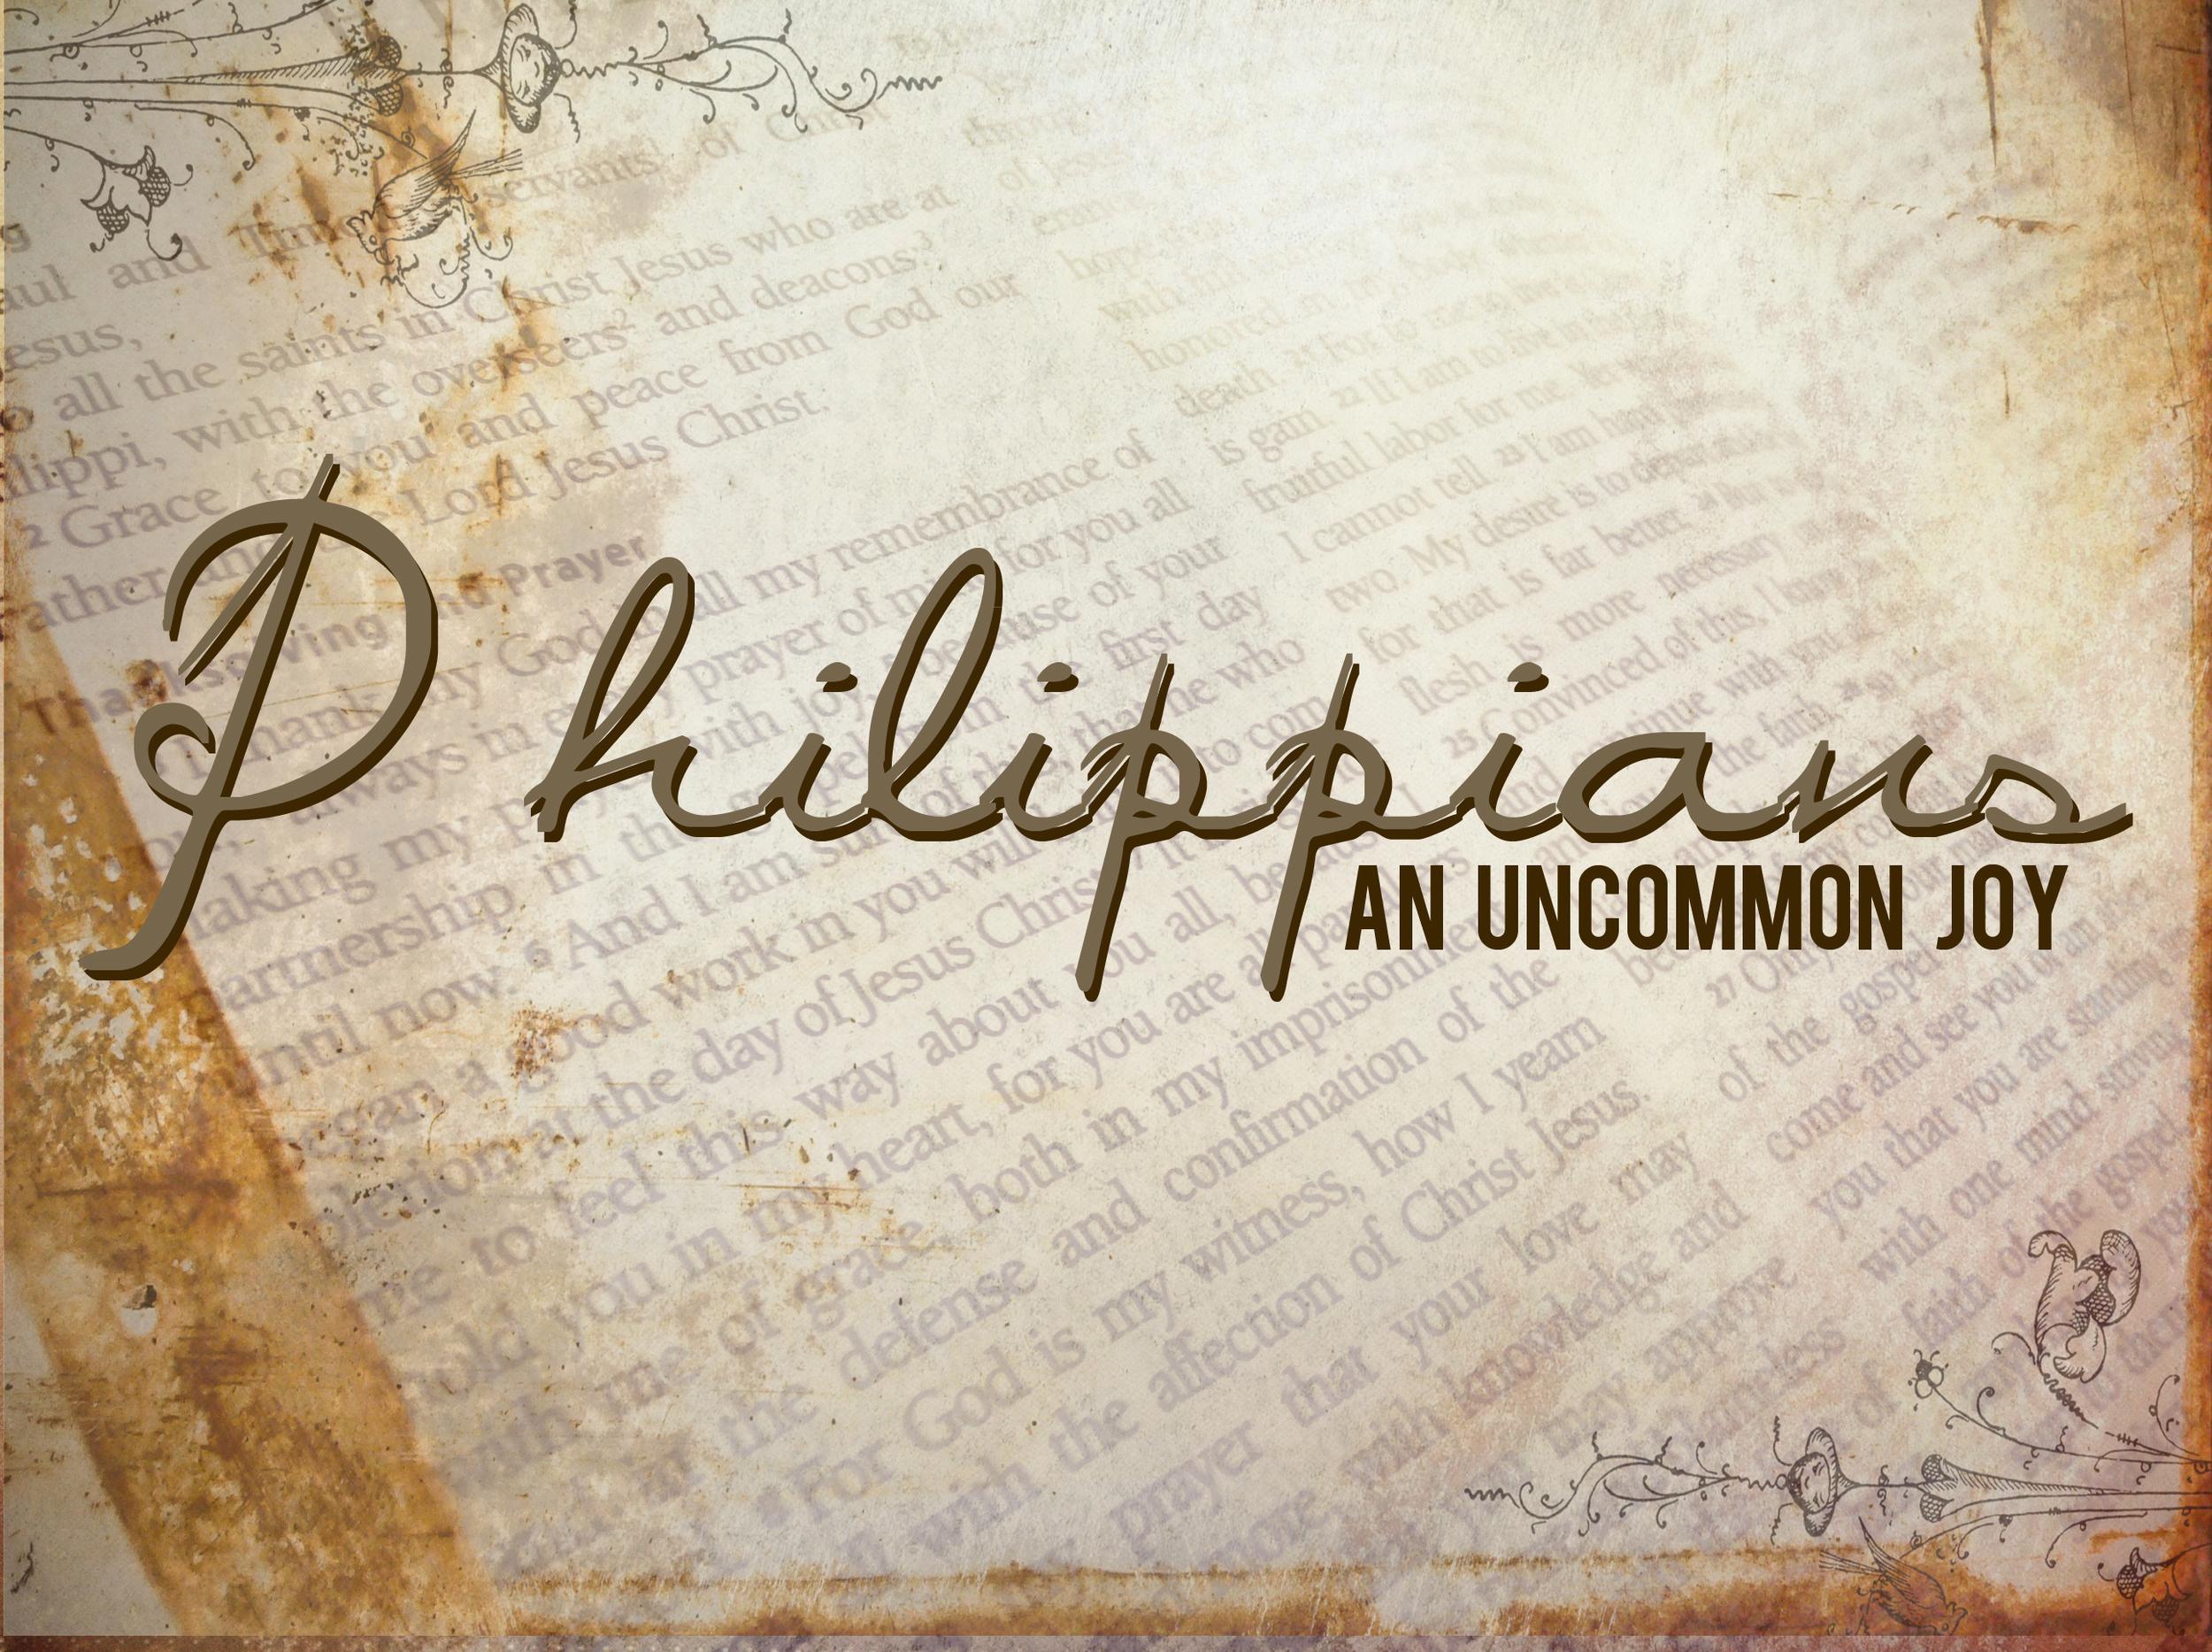 Philippians: An Uncommon Joy